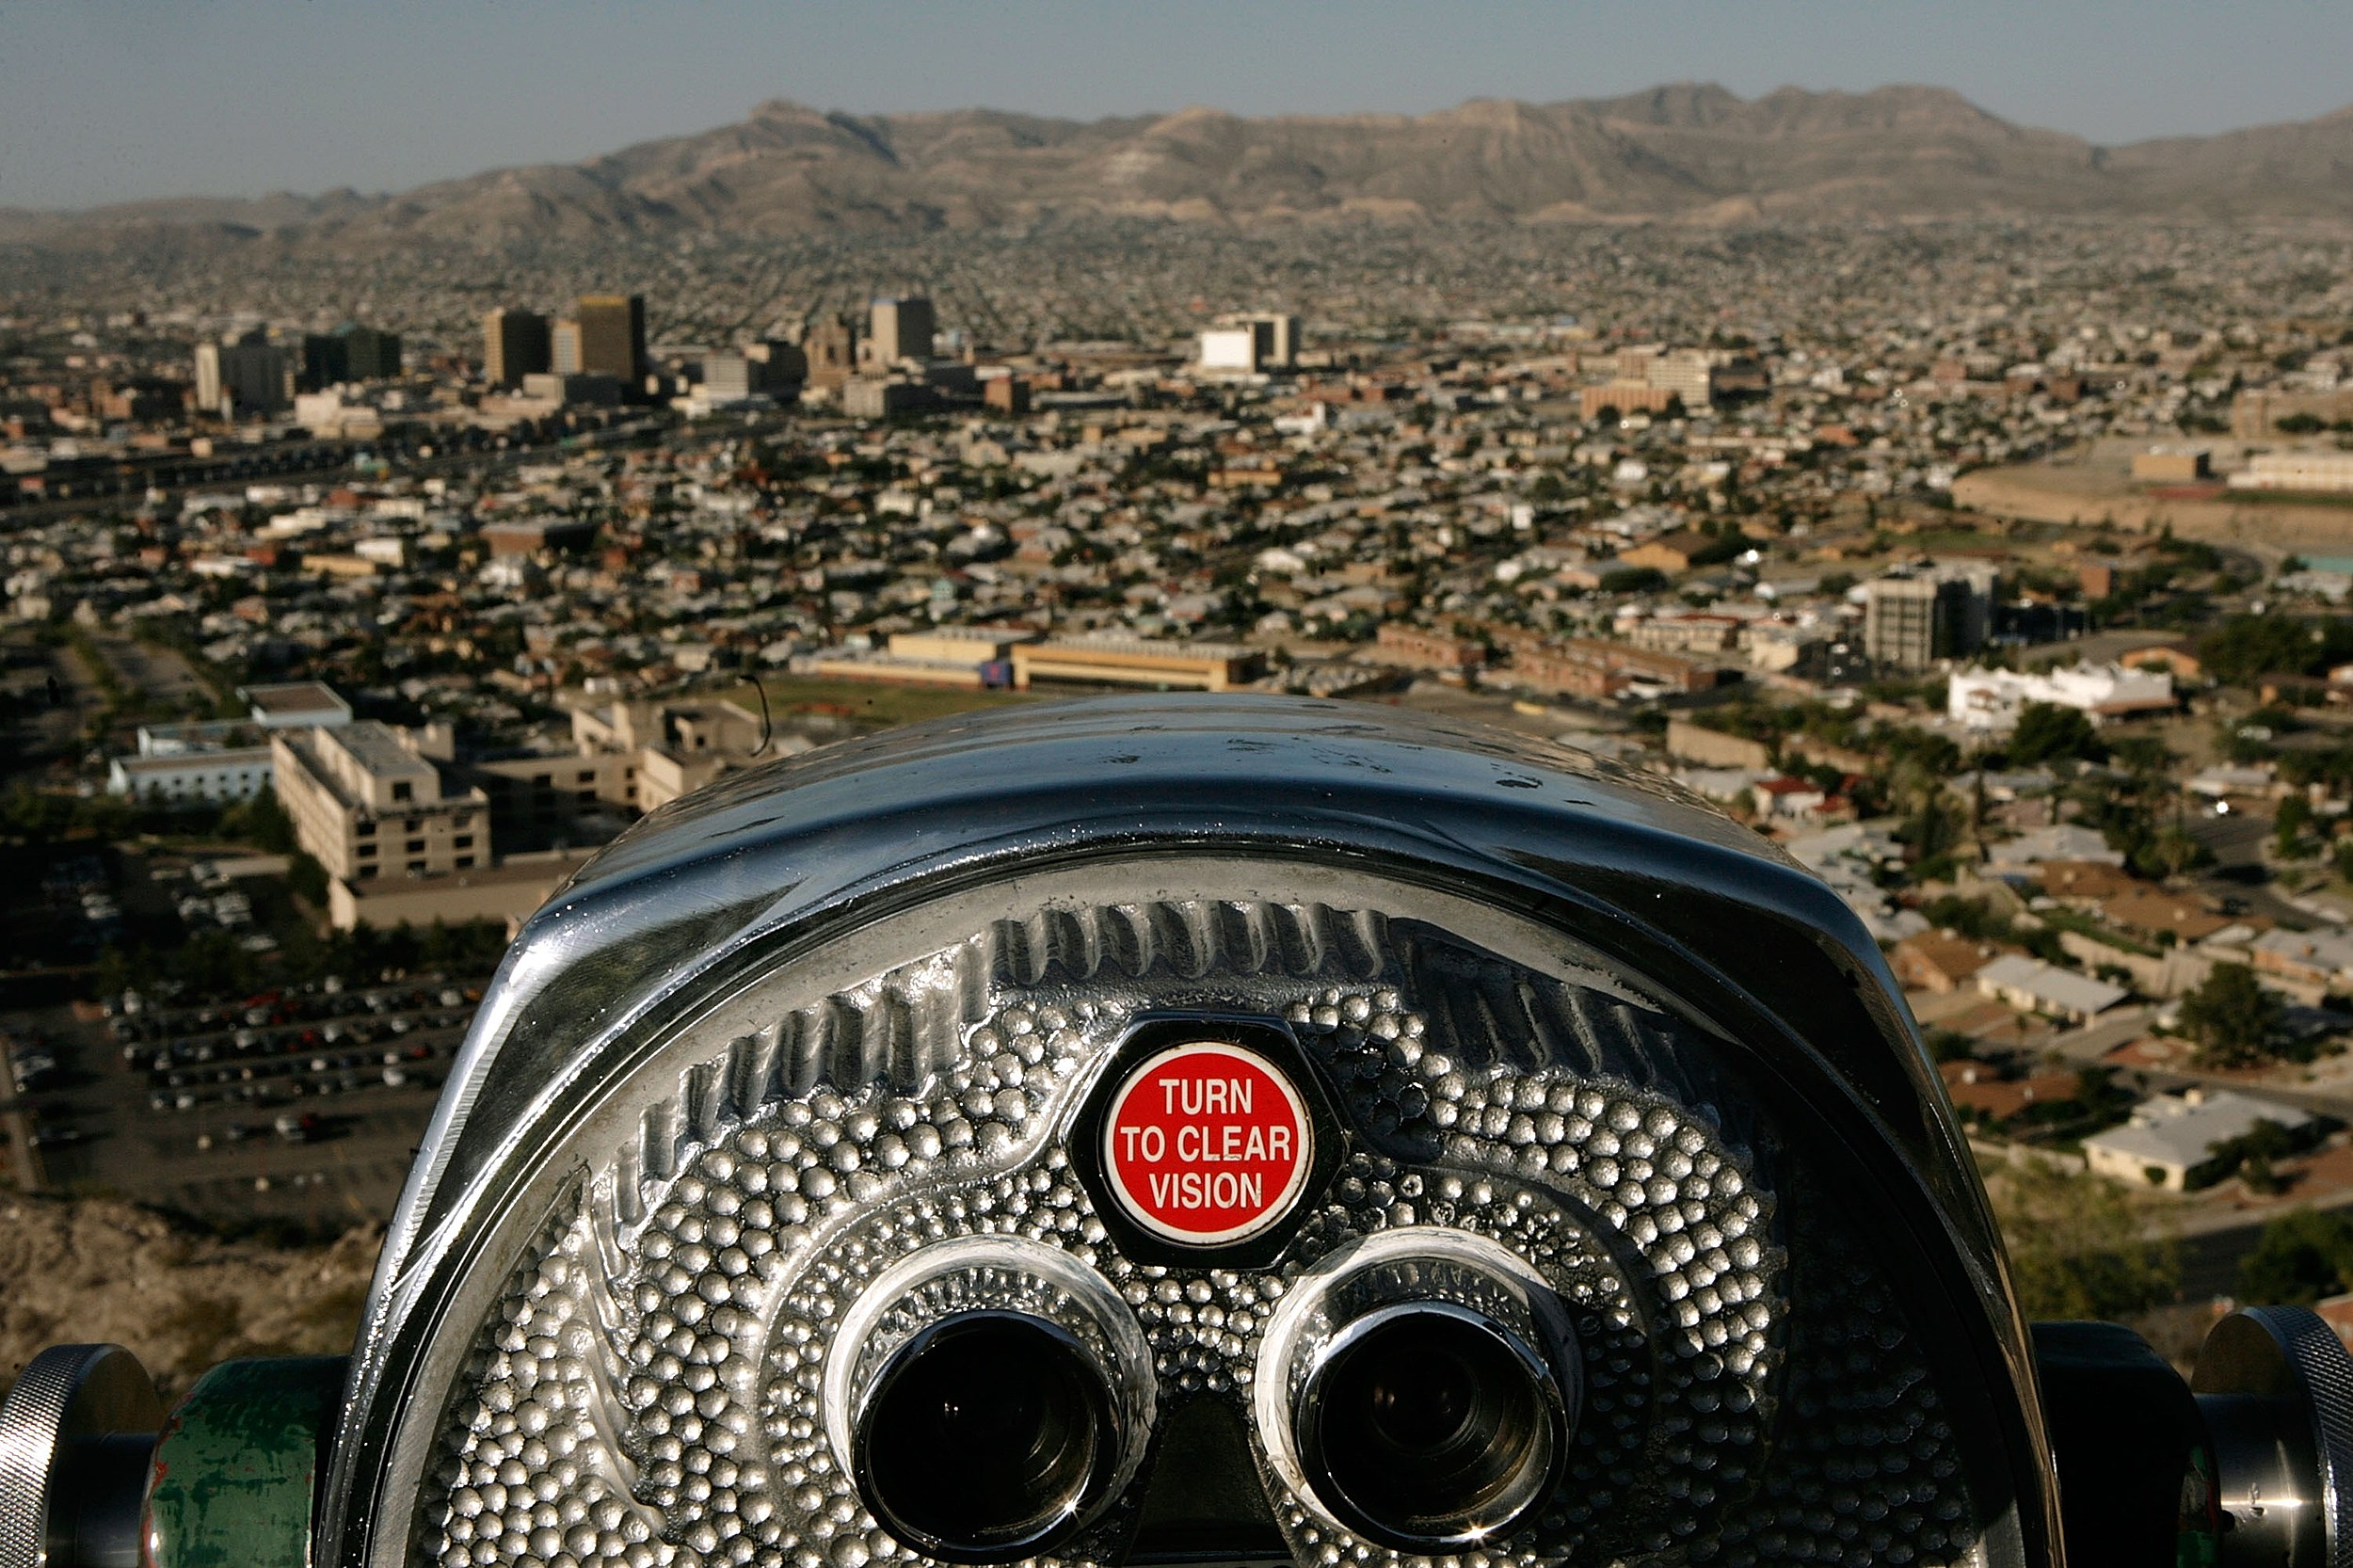 Downtown El Paso set for more demolition